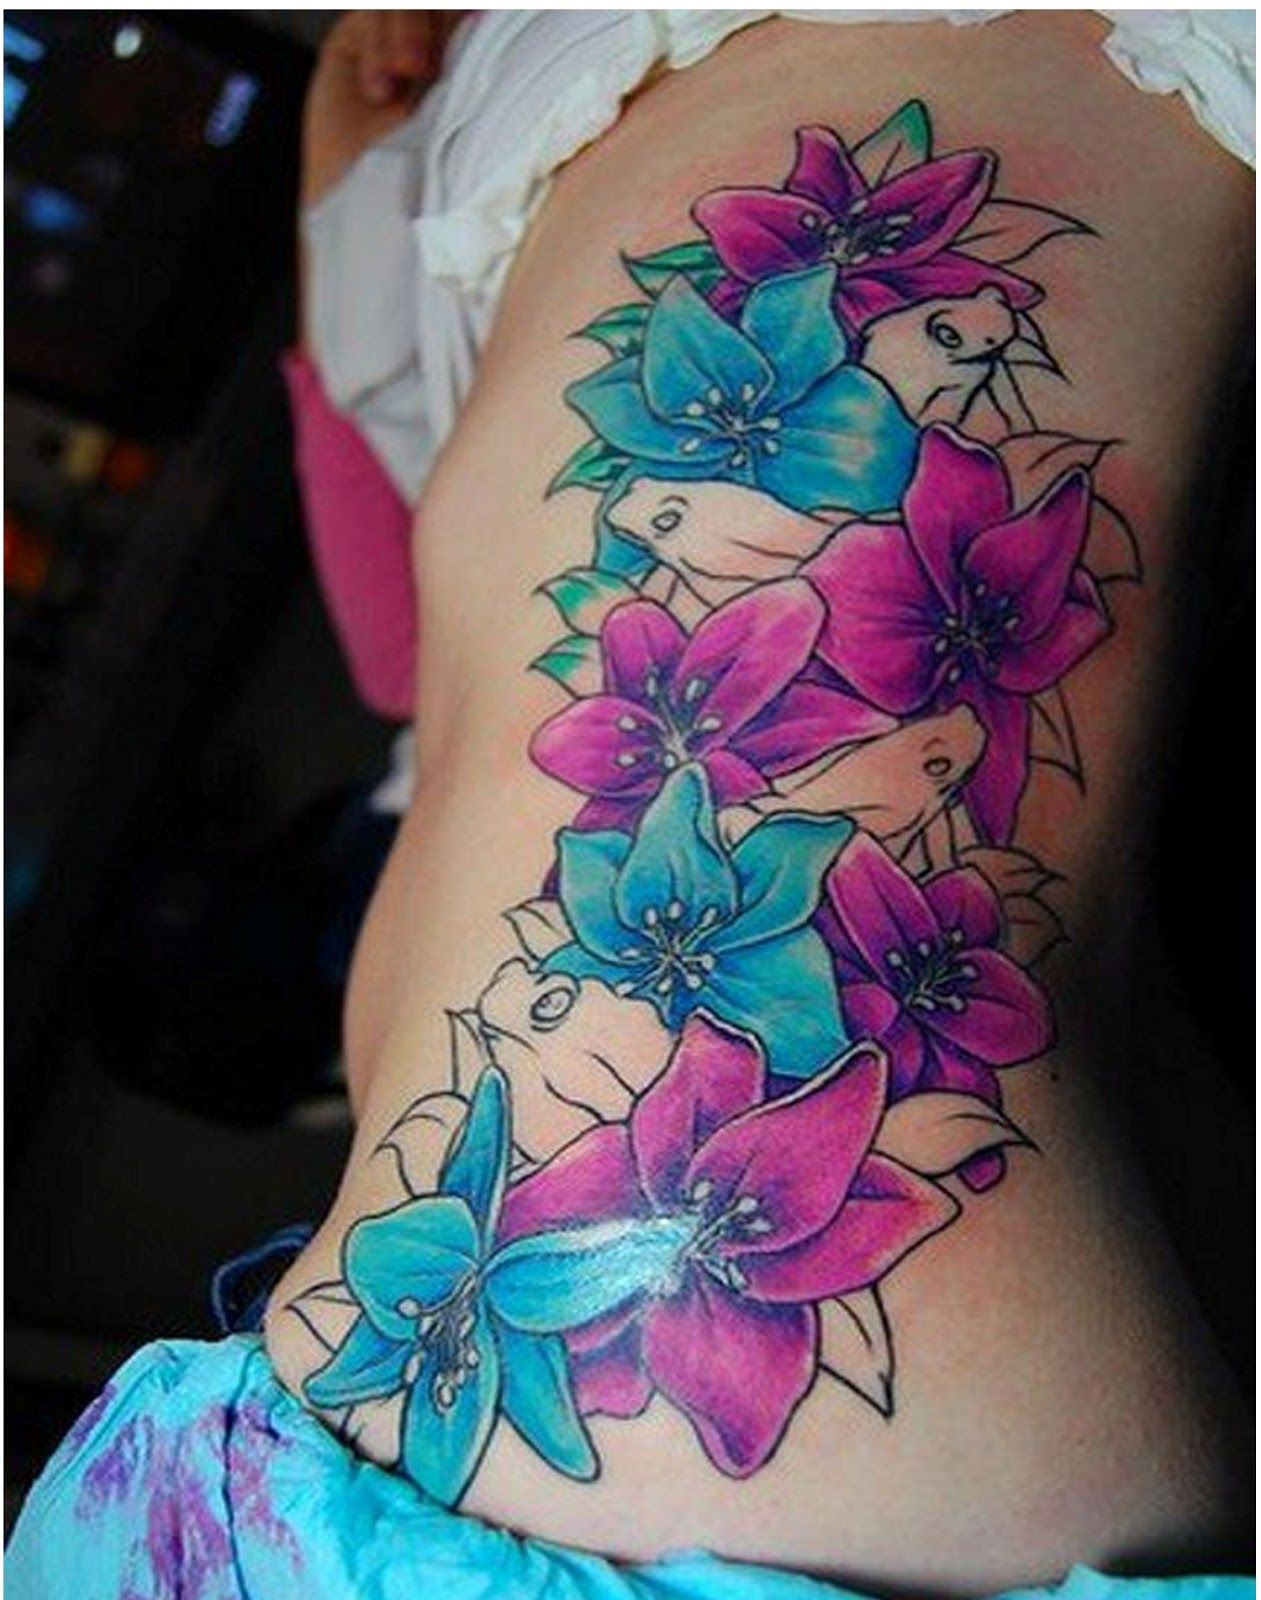 Hawaiian flower tattoos image by Rosie Rivera on Tattoos